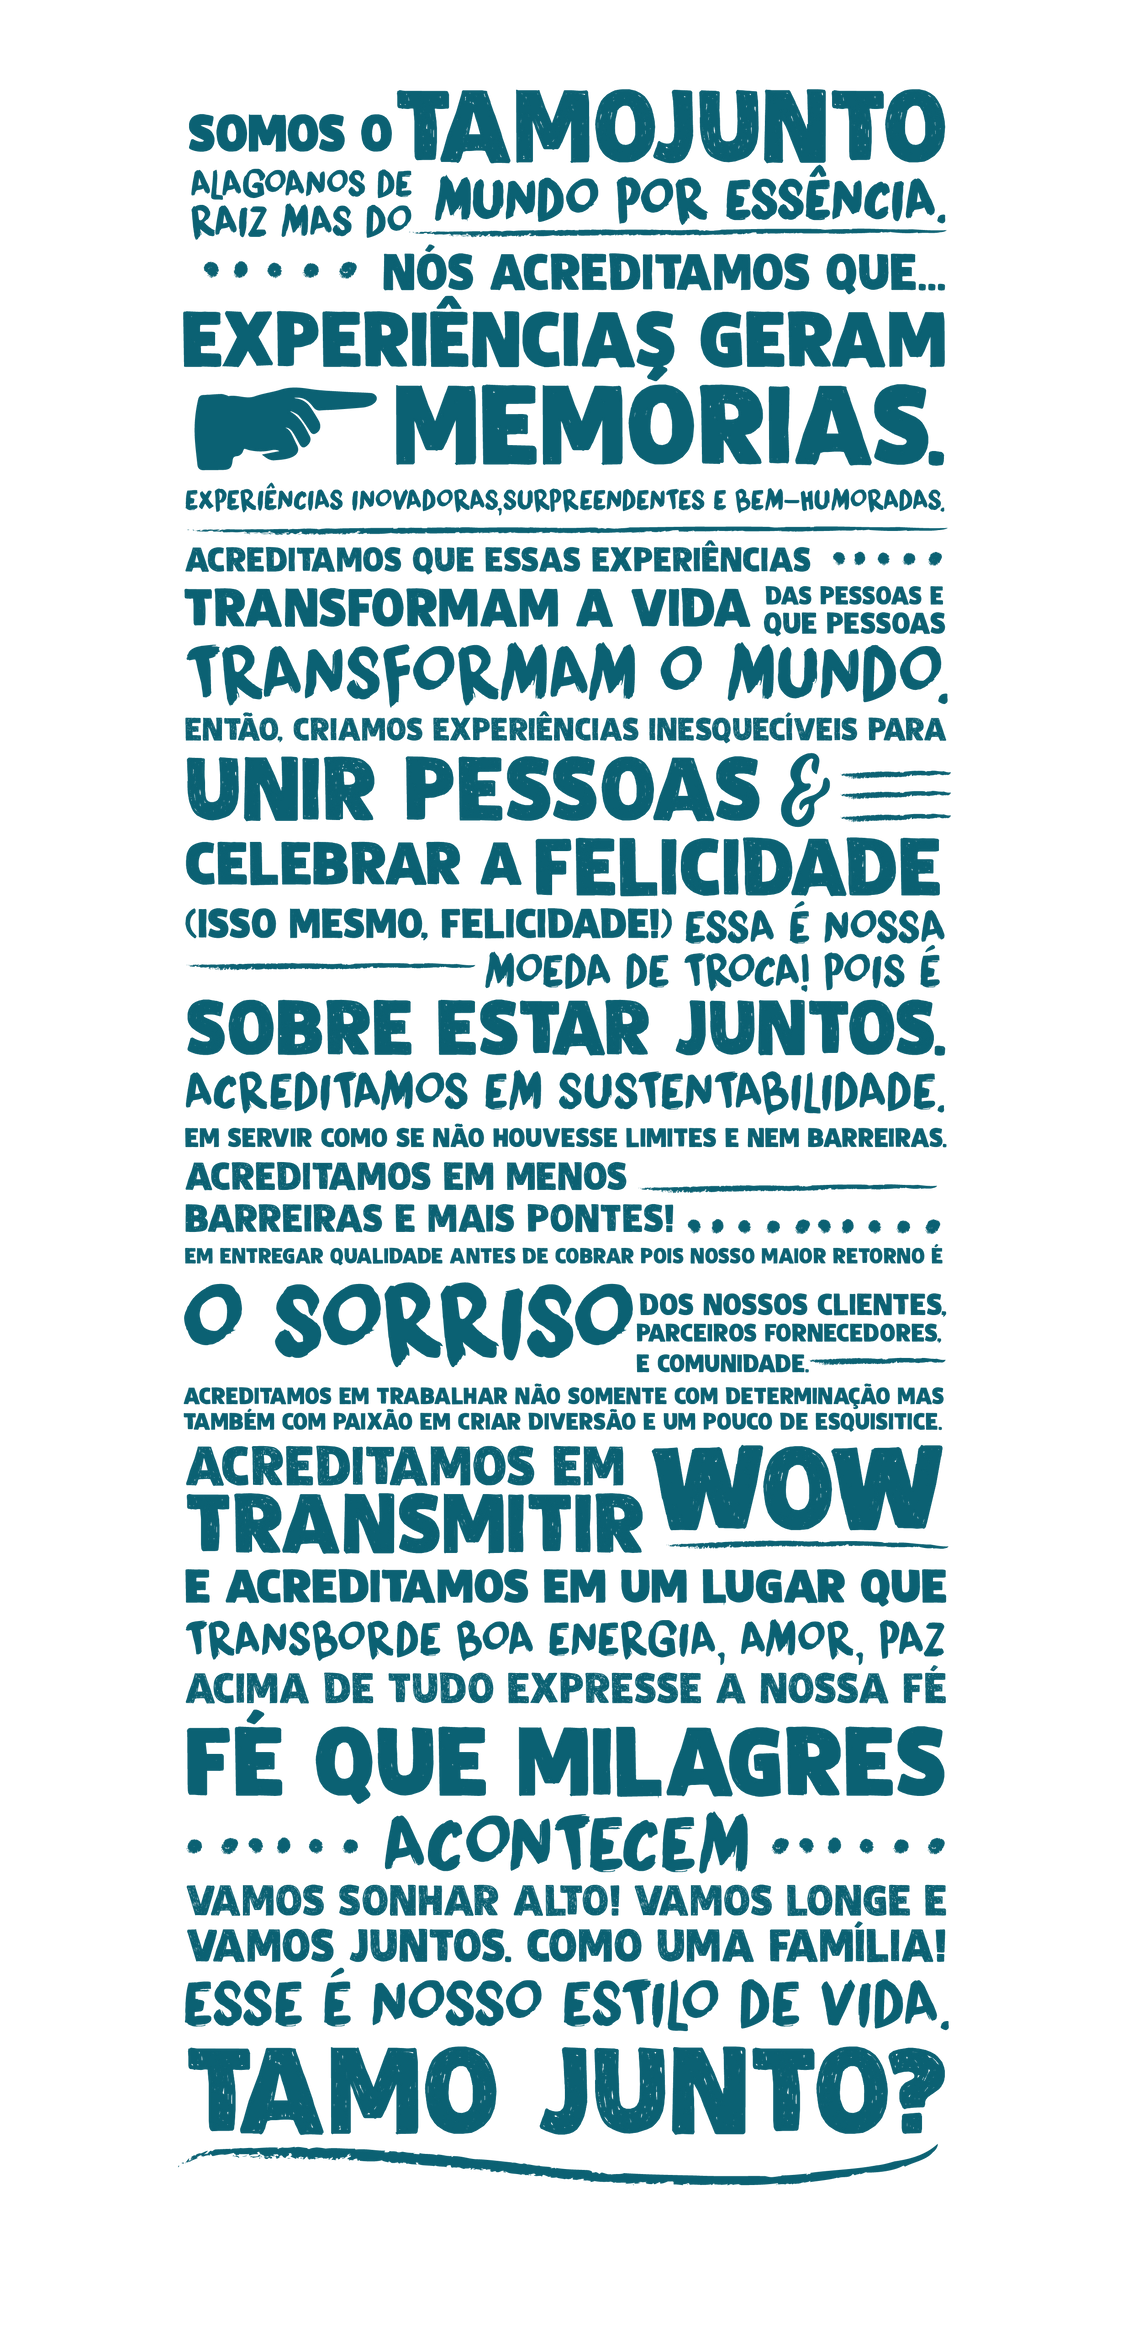 MANIFESTO-01.png